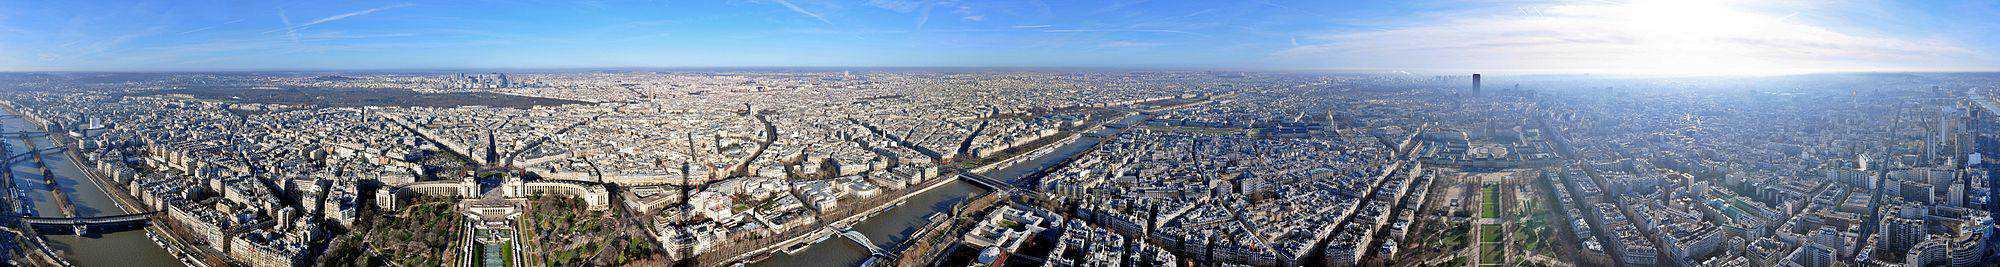 Tour Eiffel 360 Panorama Turista, cuidado: Tirar foto da Torre Eiffel dá multa!